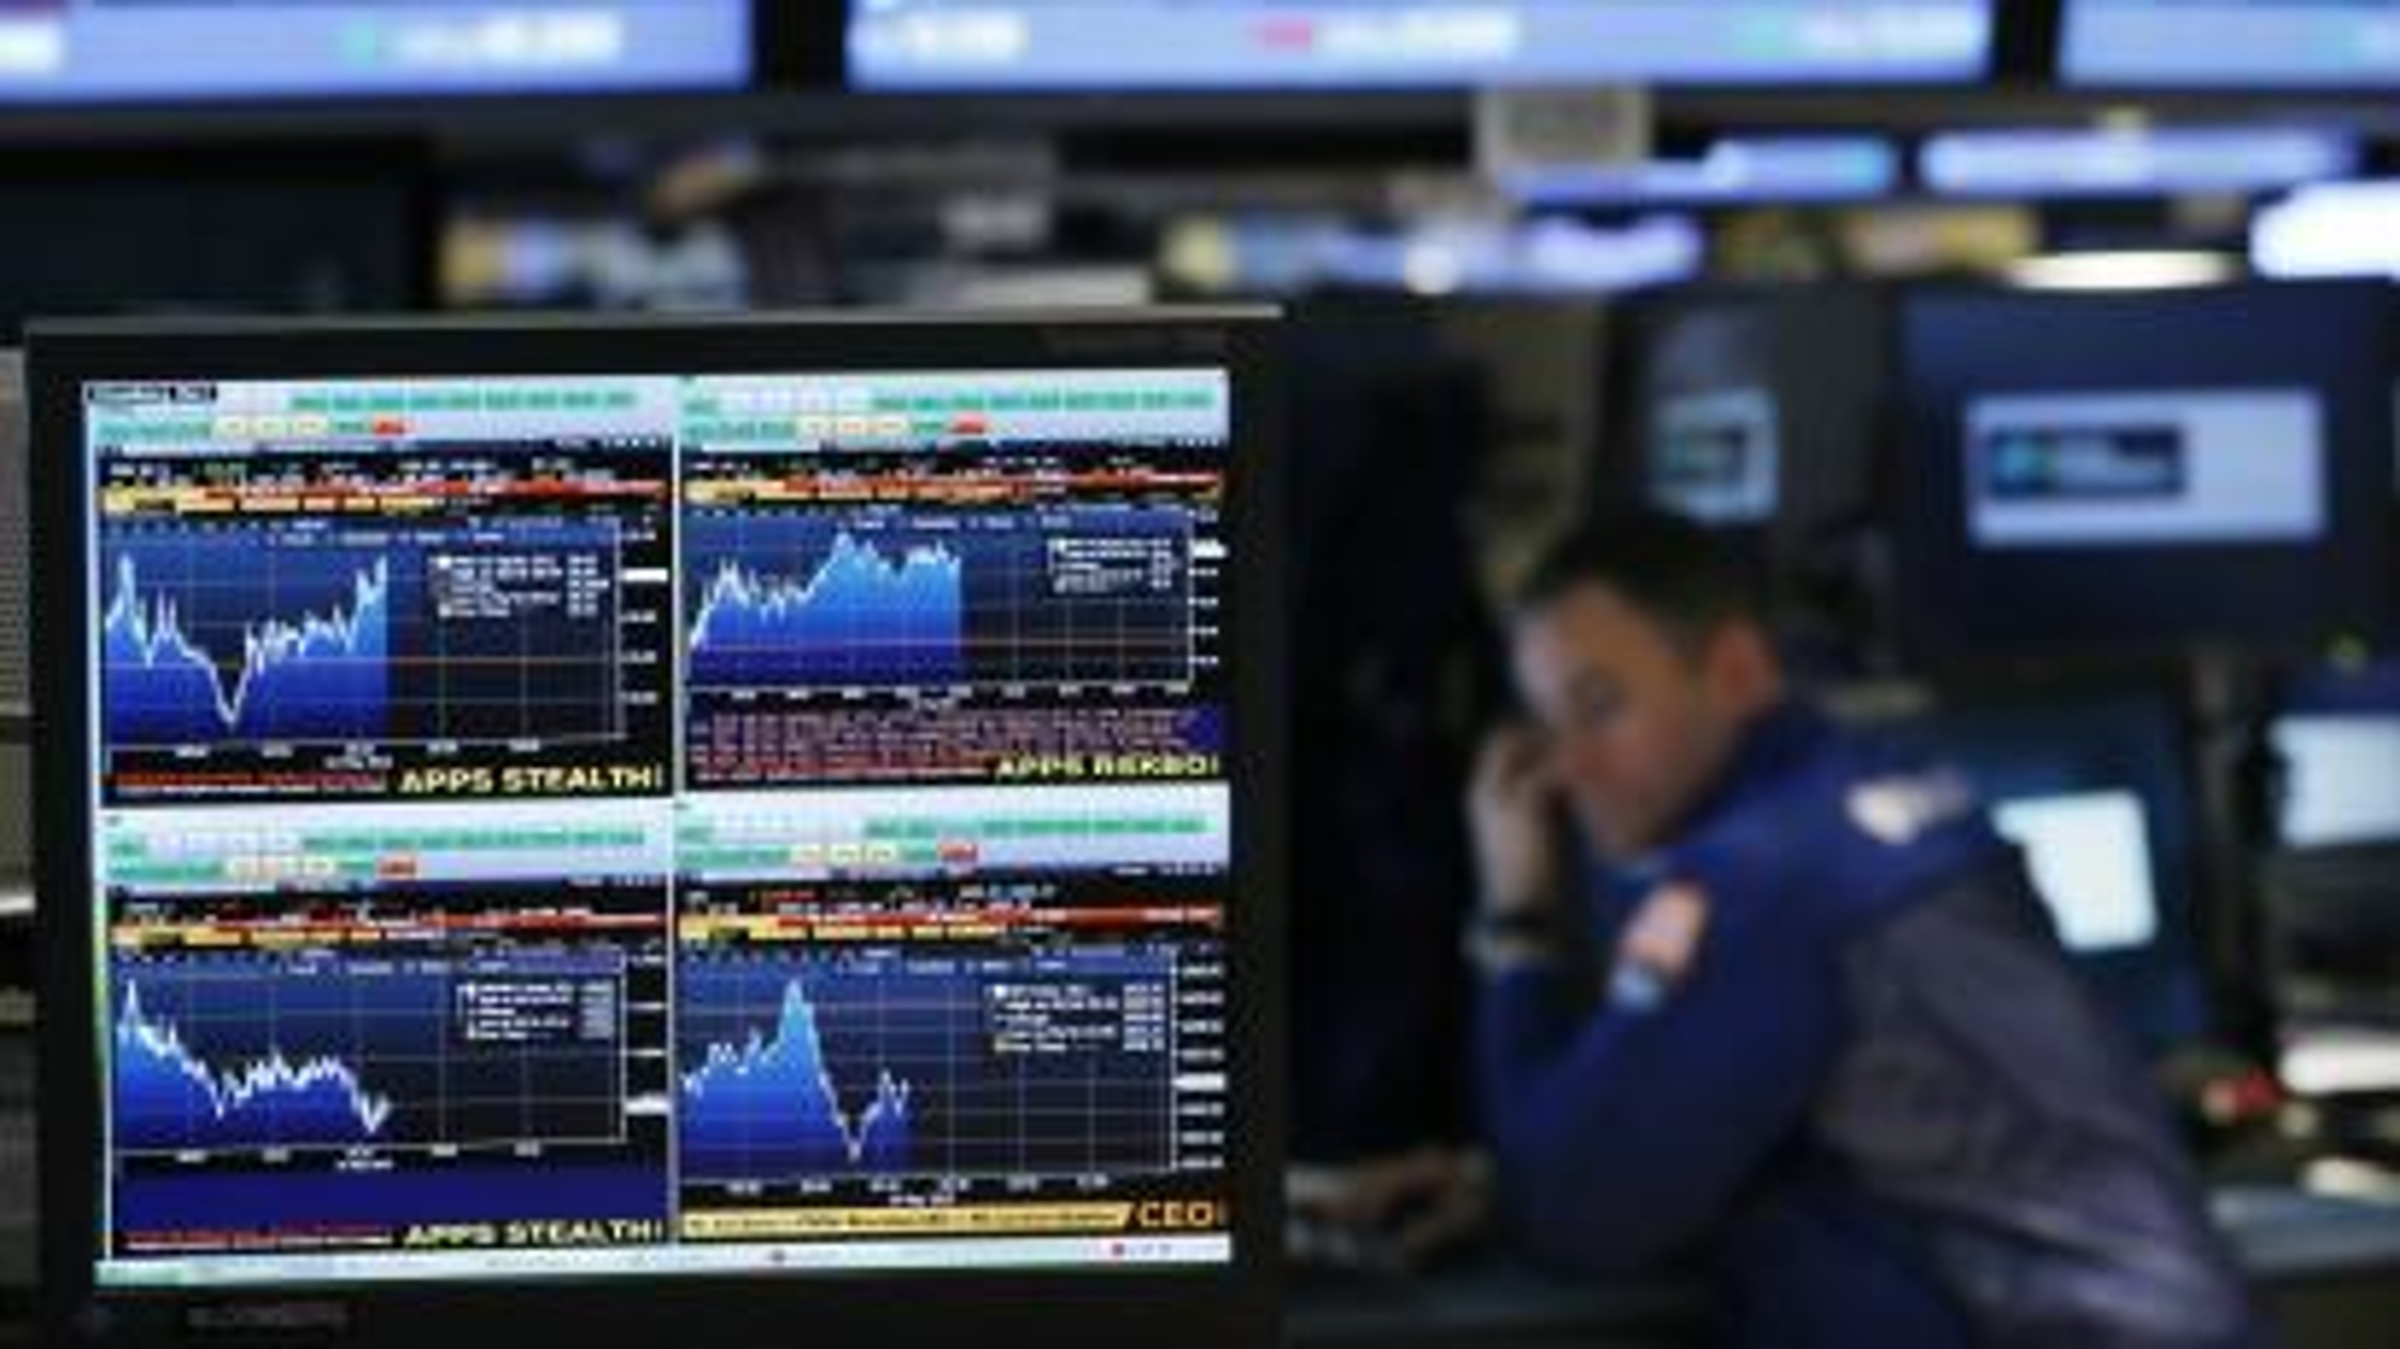 Bloomberg terminal trader trading